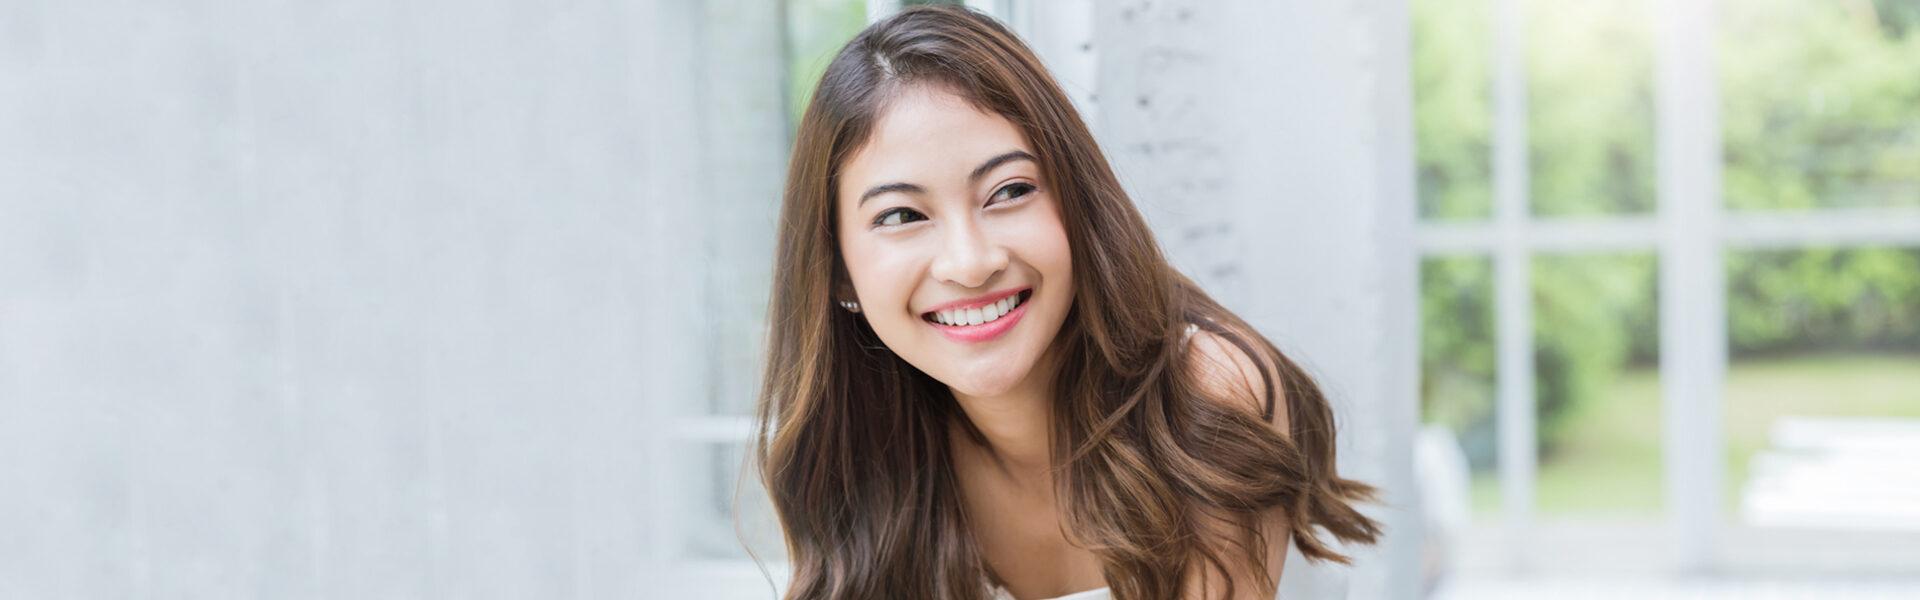 Cosmetic Dentistry in Wellesley, MA